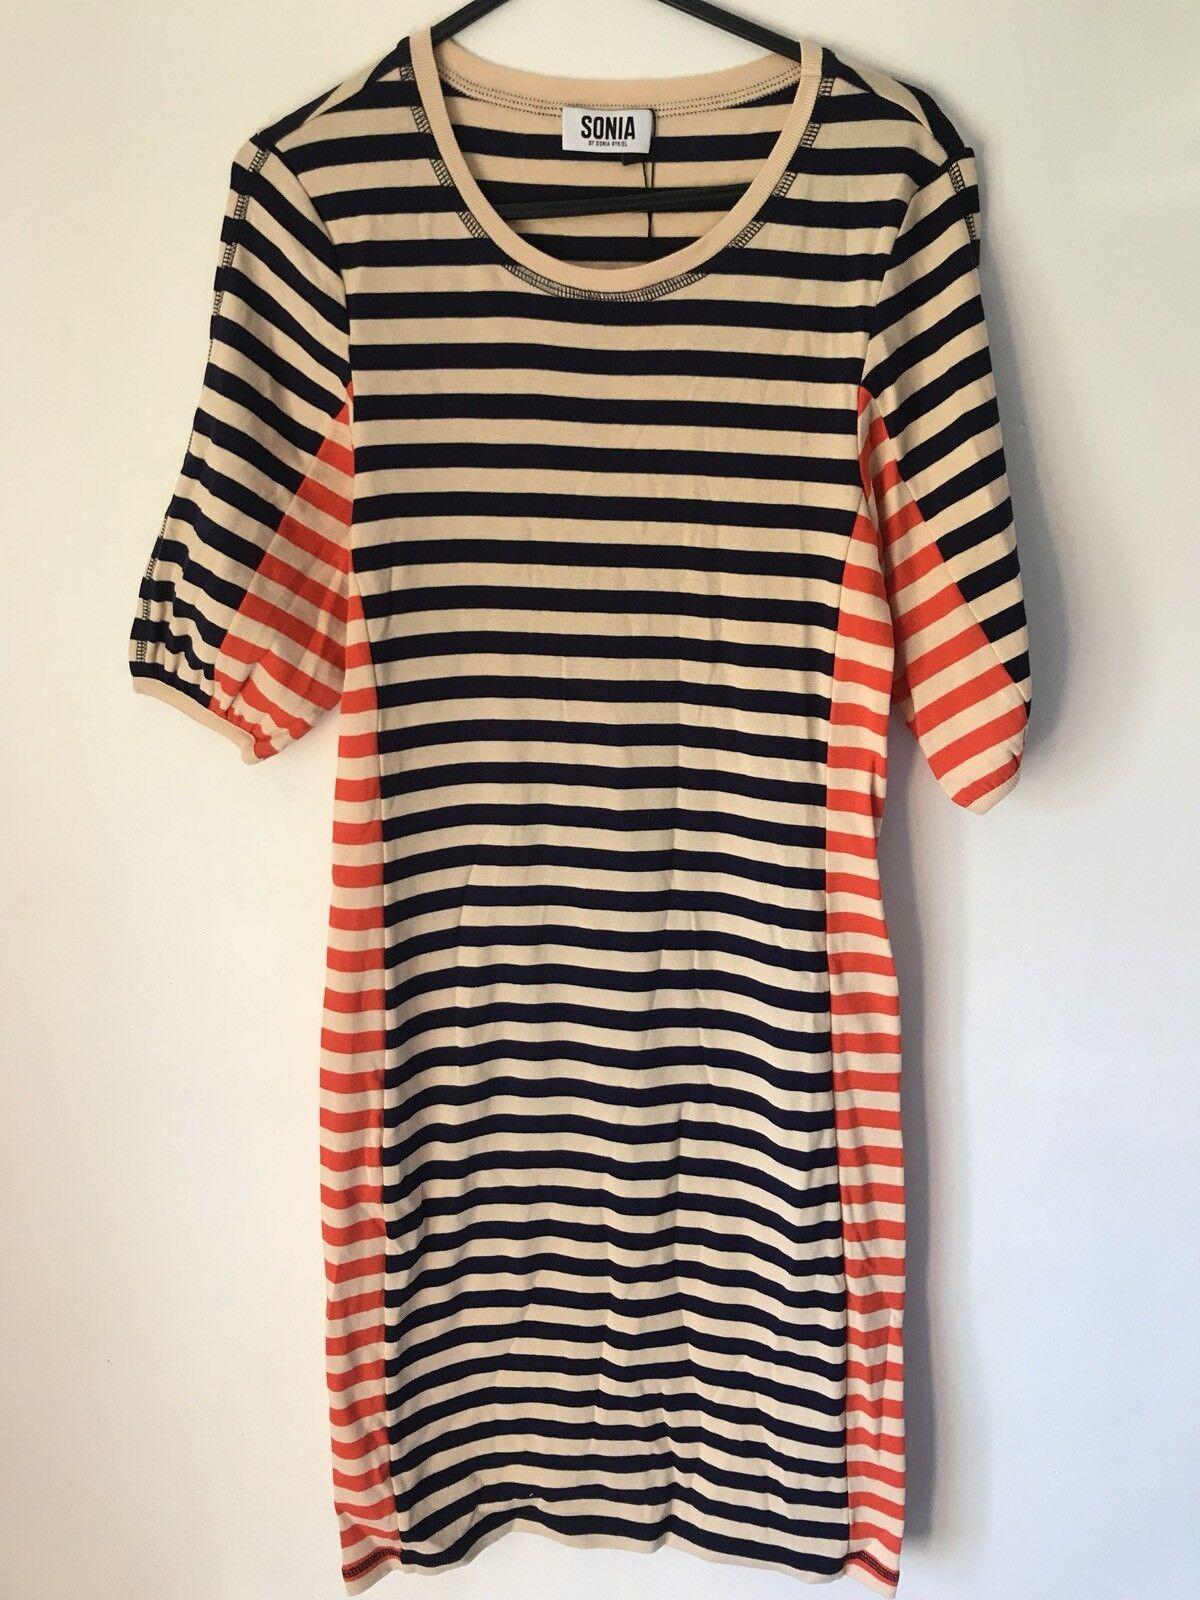 Designer Sonia Sonia Sonia By Sonia Rykiel Striped T-Shirt Dress Navy RRP  XS Brand New 00ca22